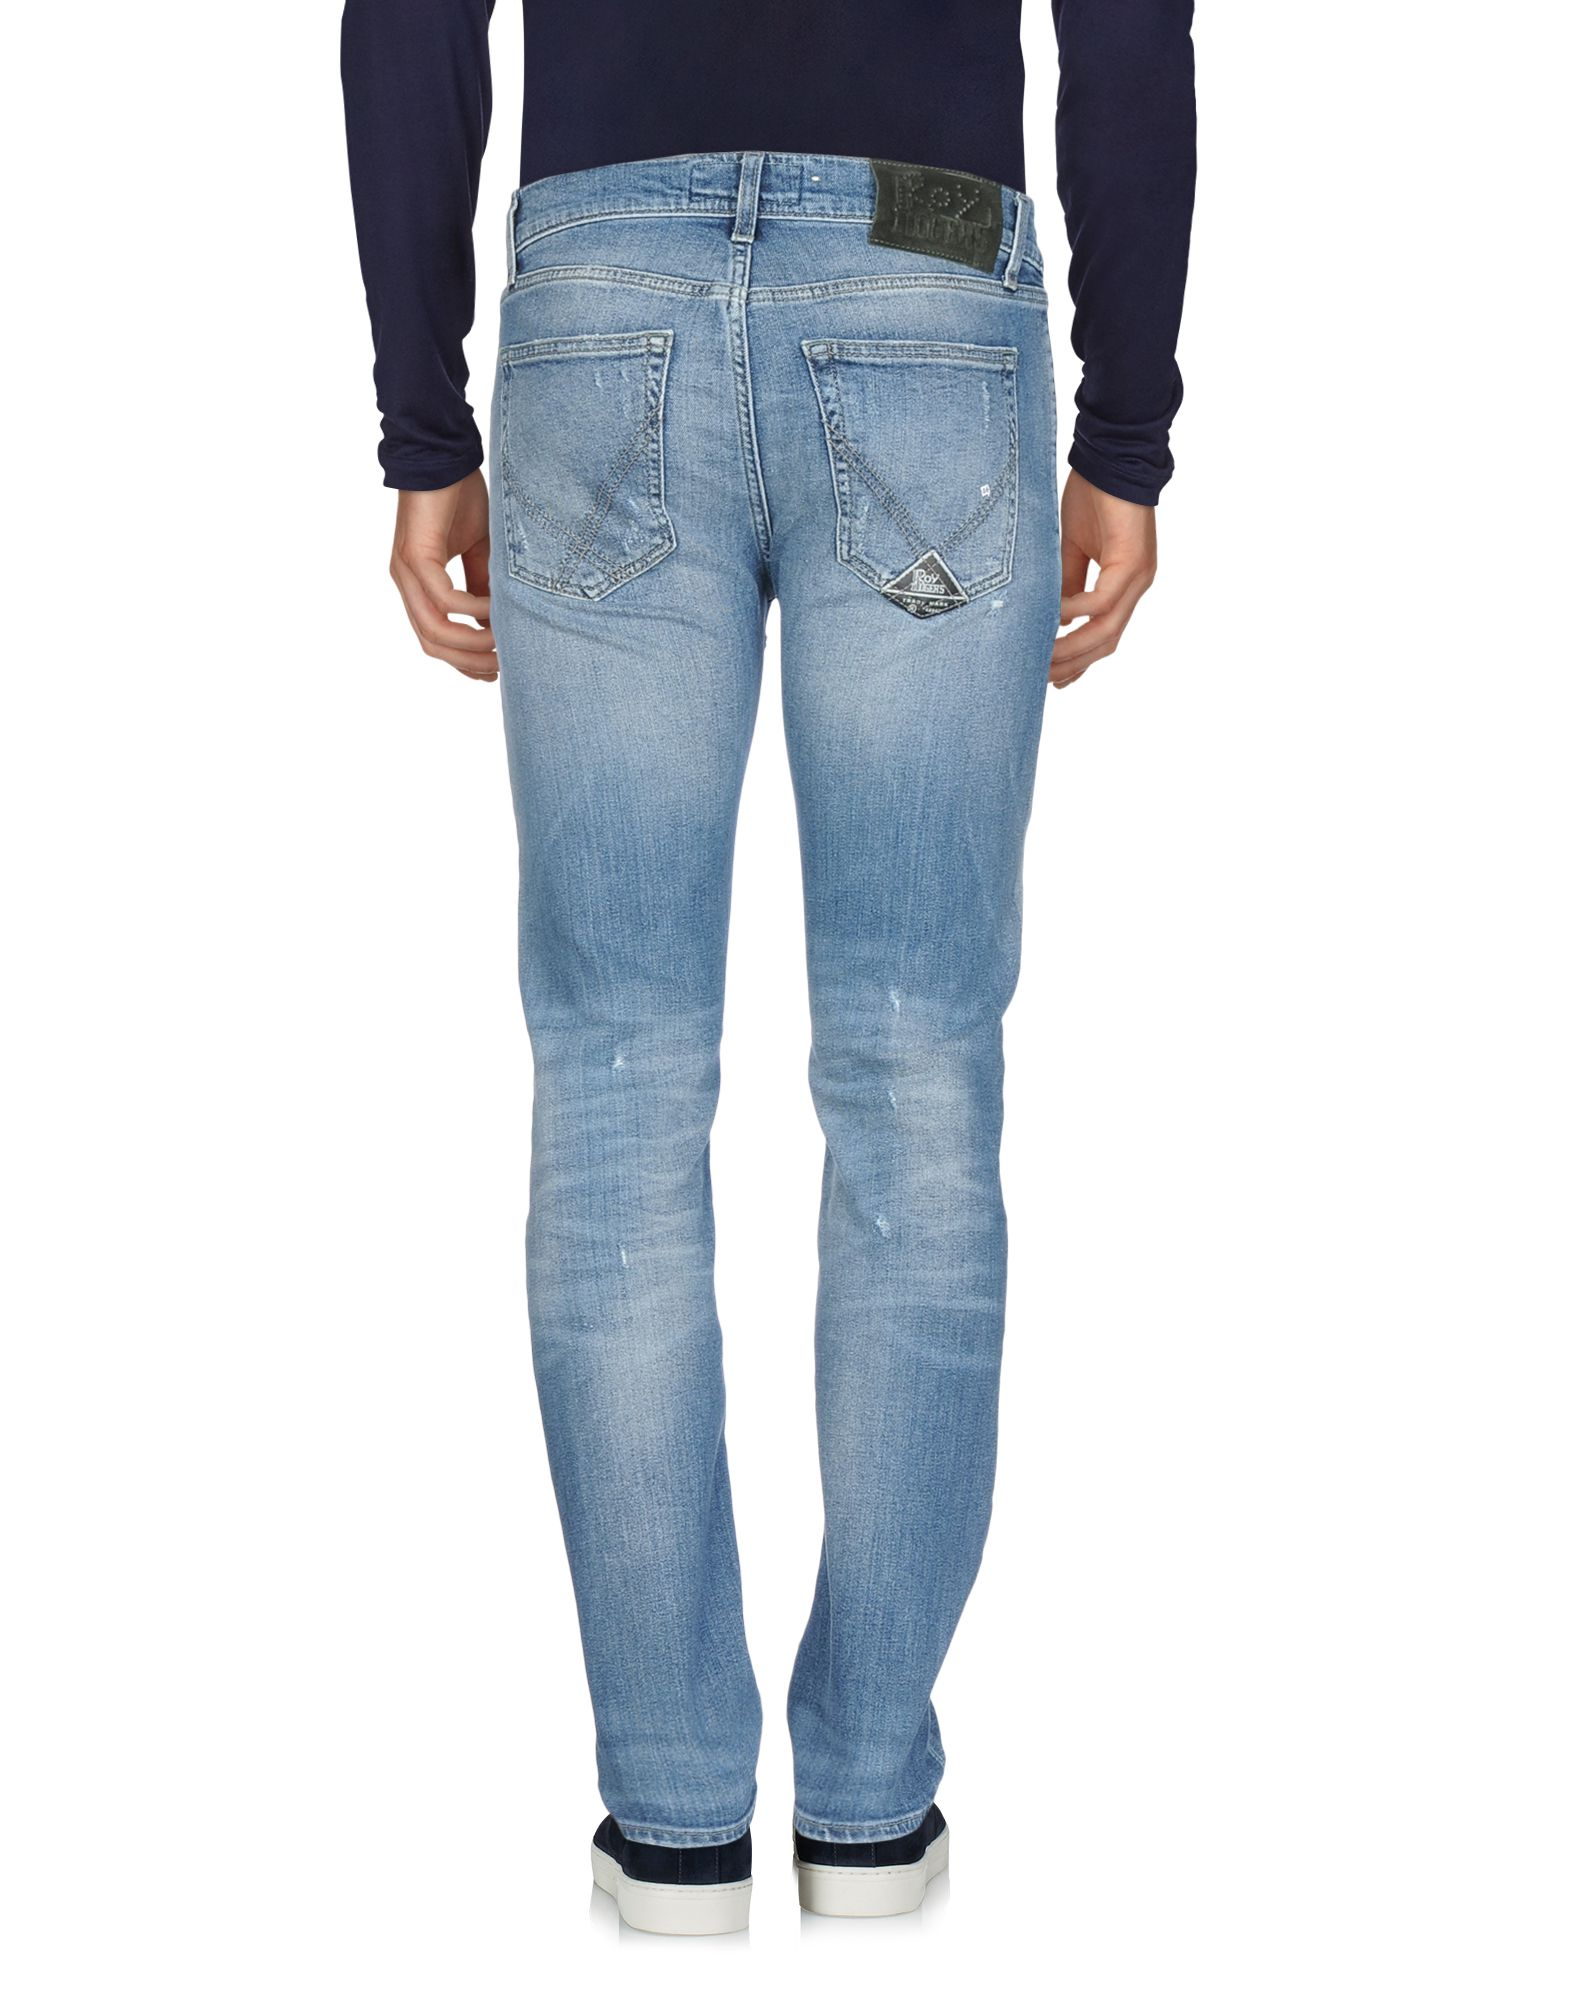 Pantaloni Jeans Ro 42665926GD  Roger's Uomo - 42665926GD Ro 872a53